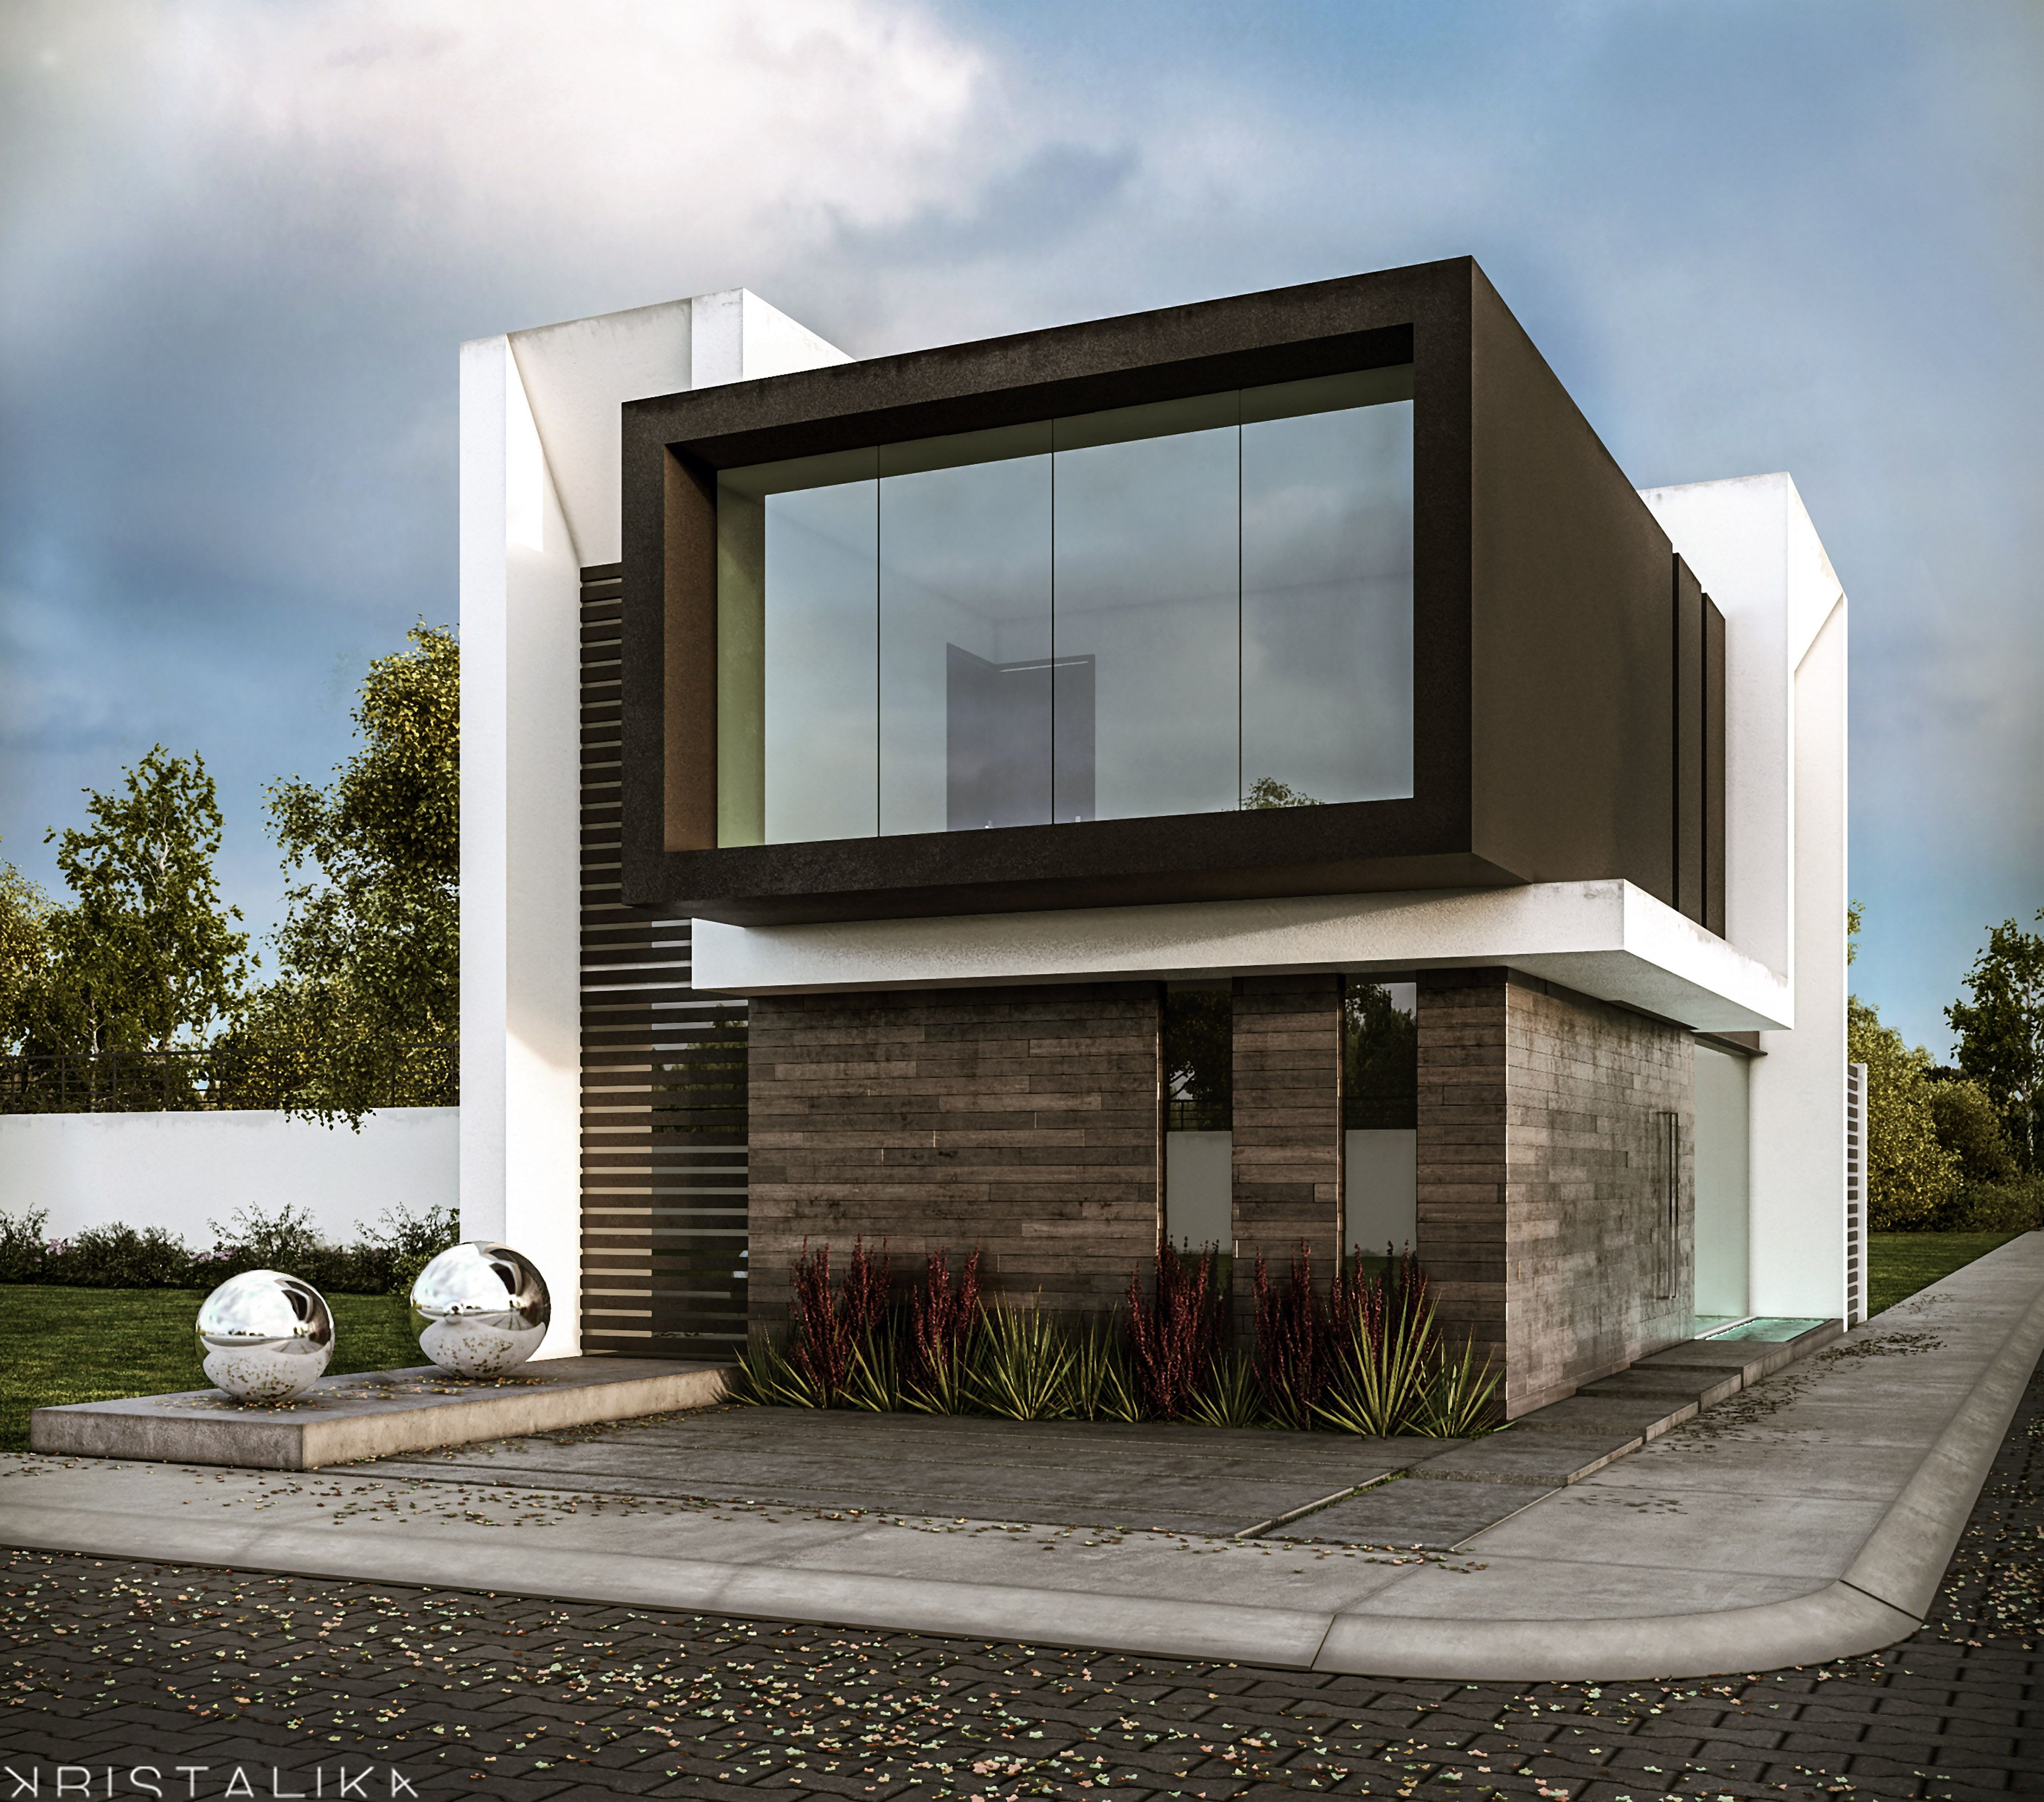 Rsi 1 house residencias contemporaneas pinterest for Fachadas exteriores minimalistas